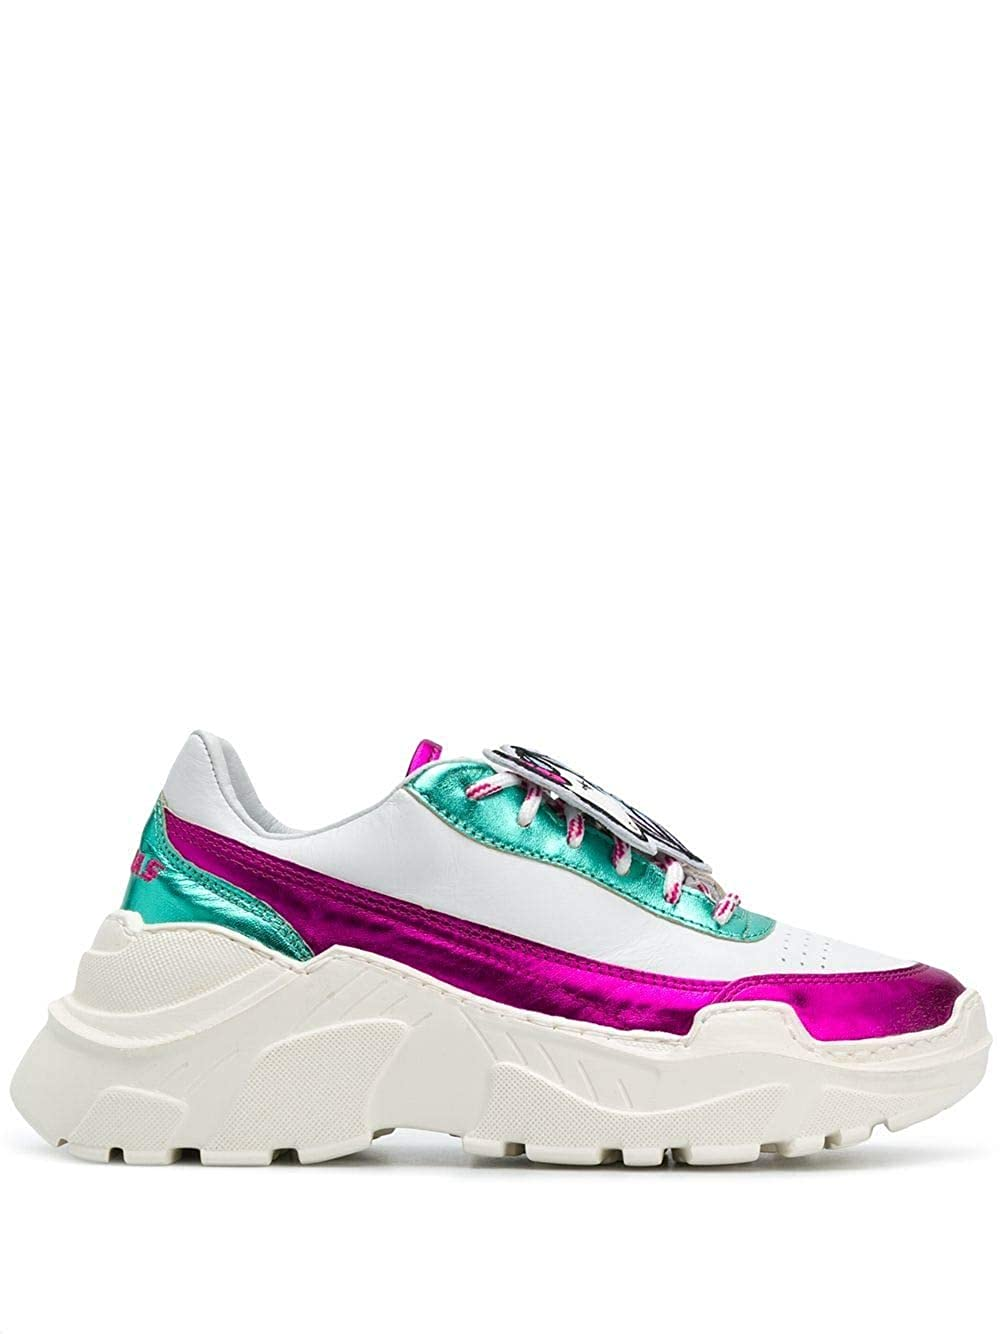 - JOSHUA SANDERS Women's 10584IRENE White Leather Sneakers